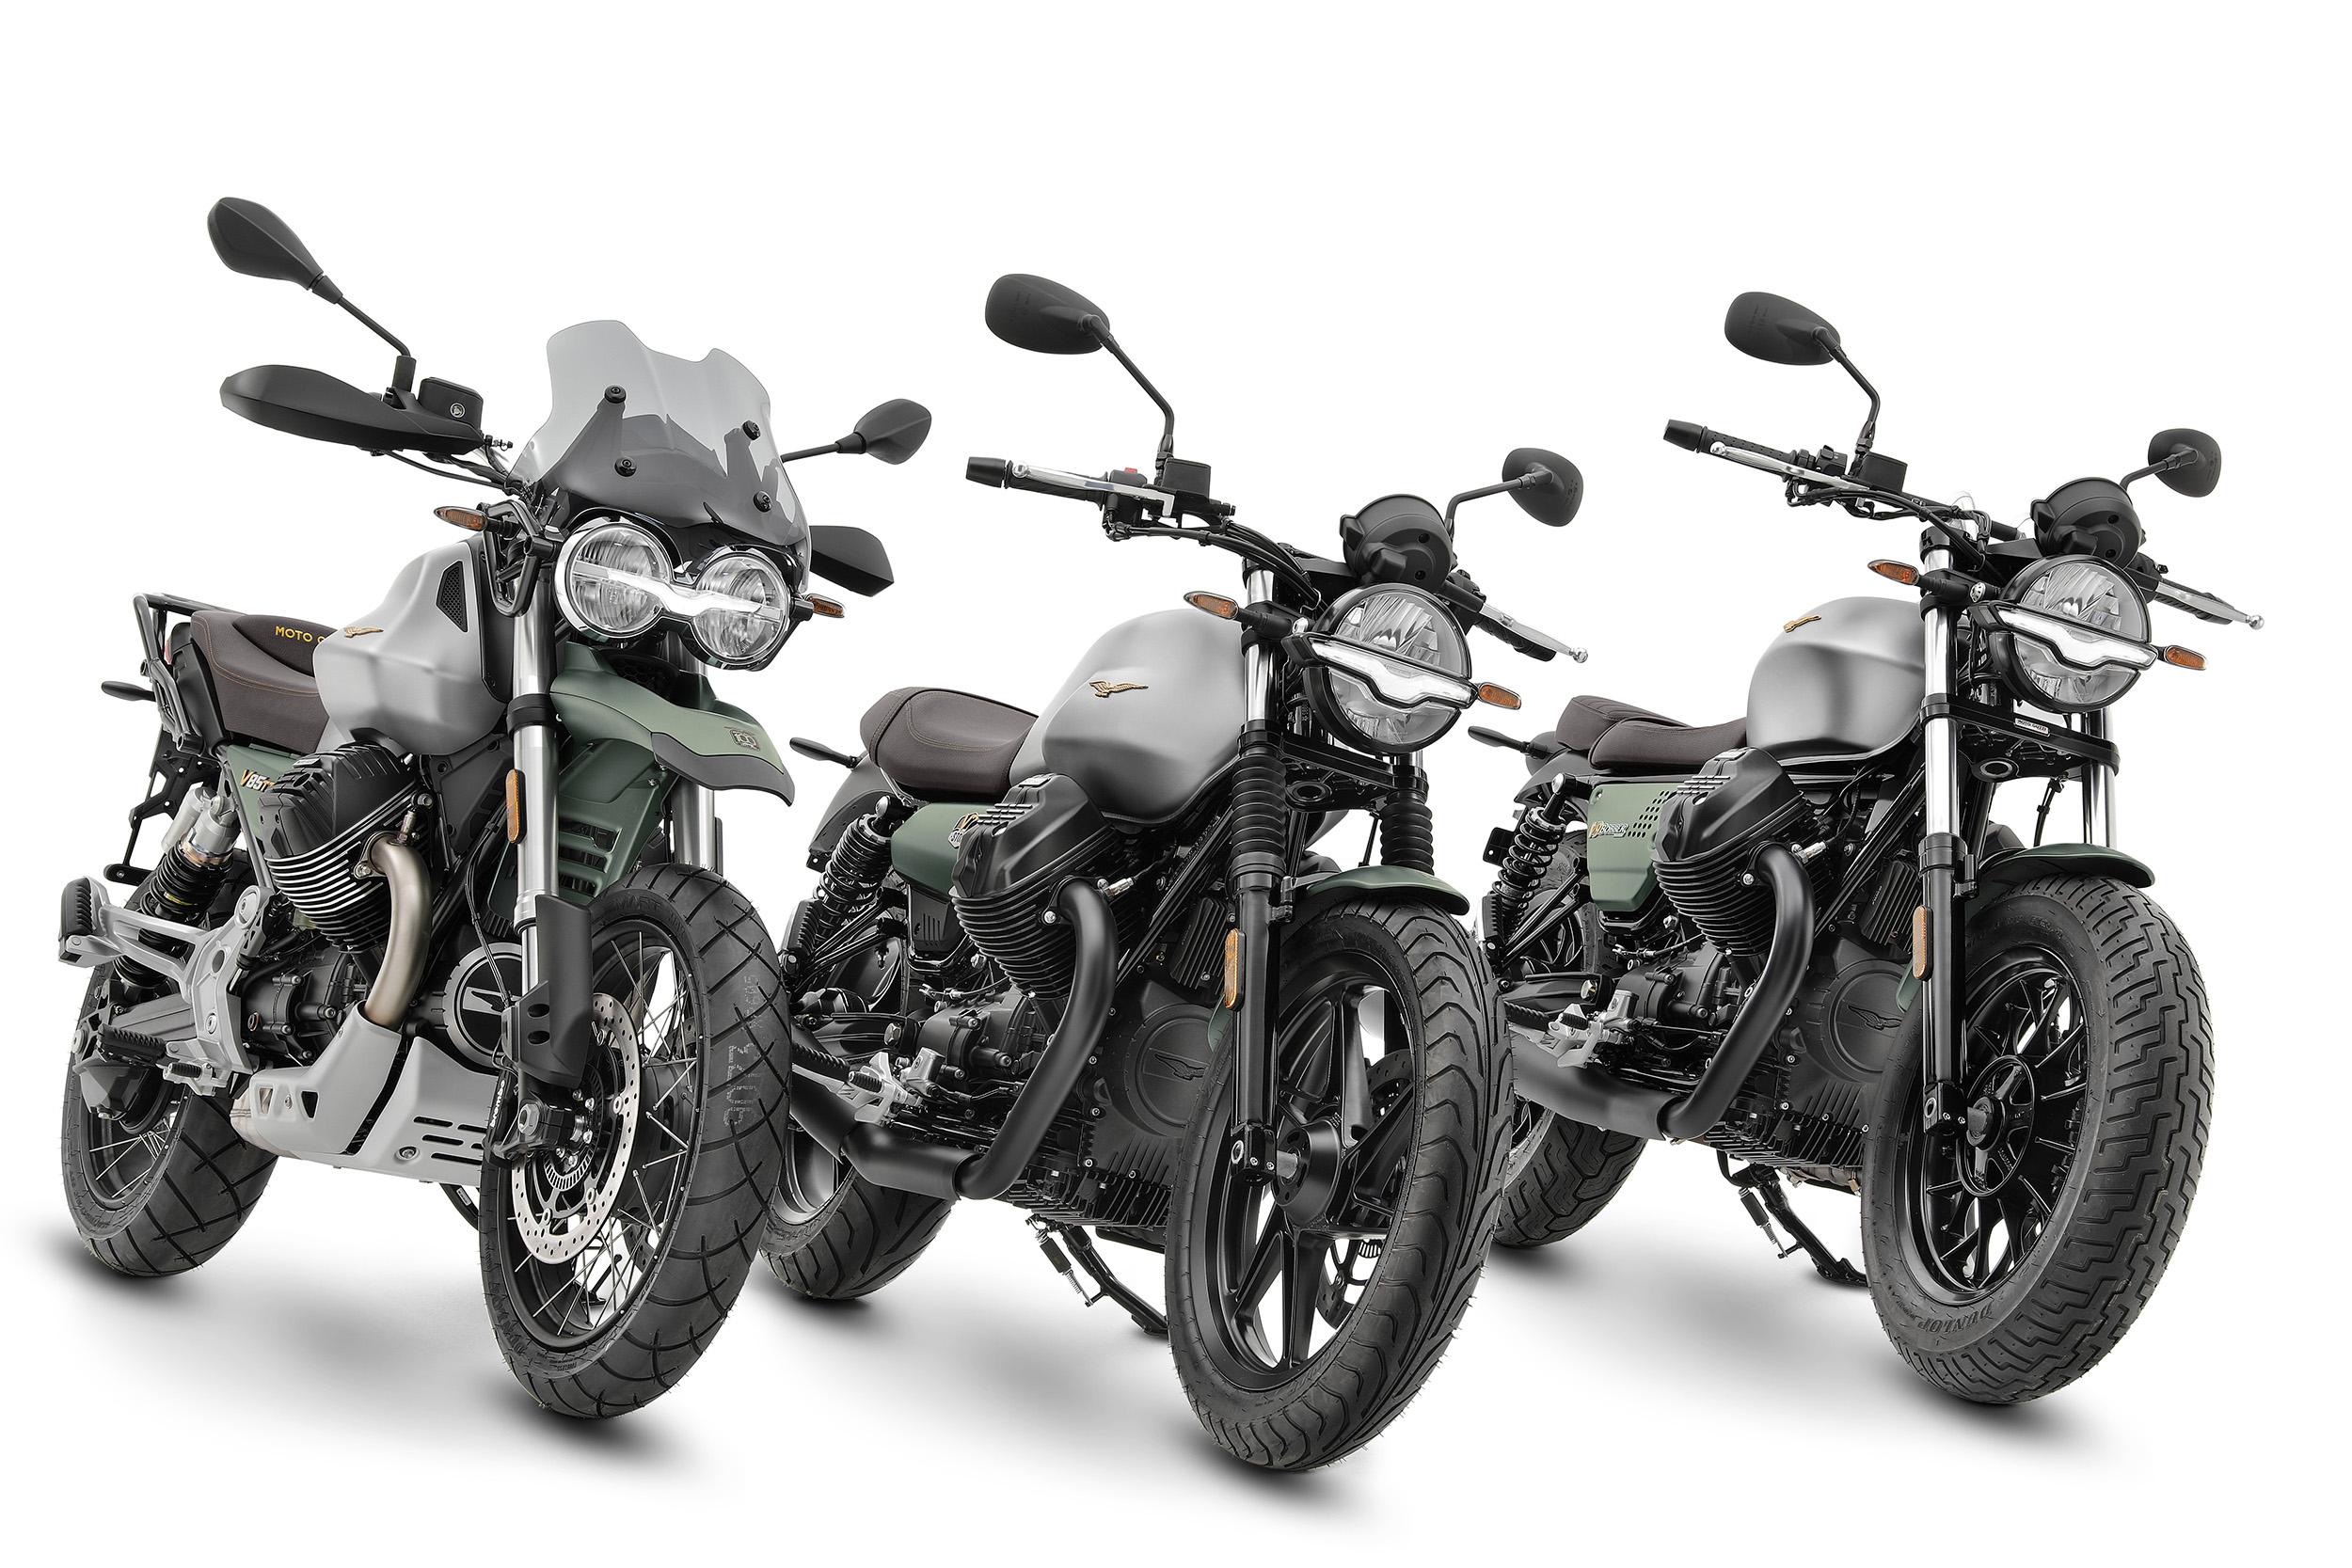 Moto Guzzi celebrates 100 years